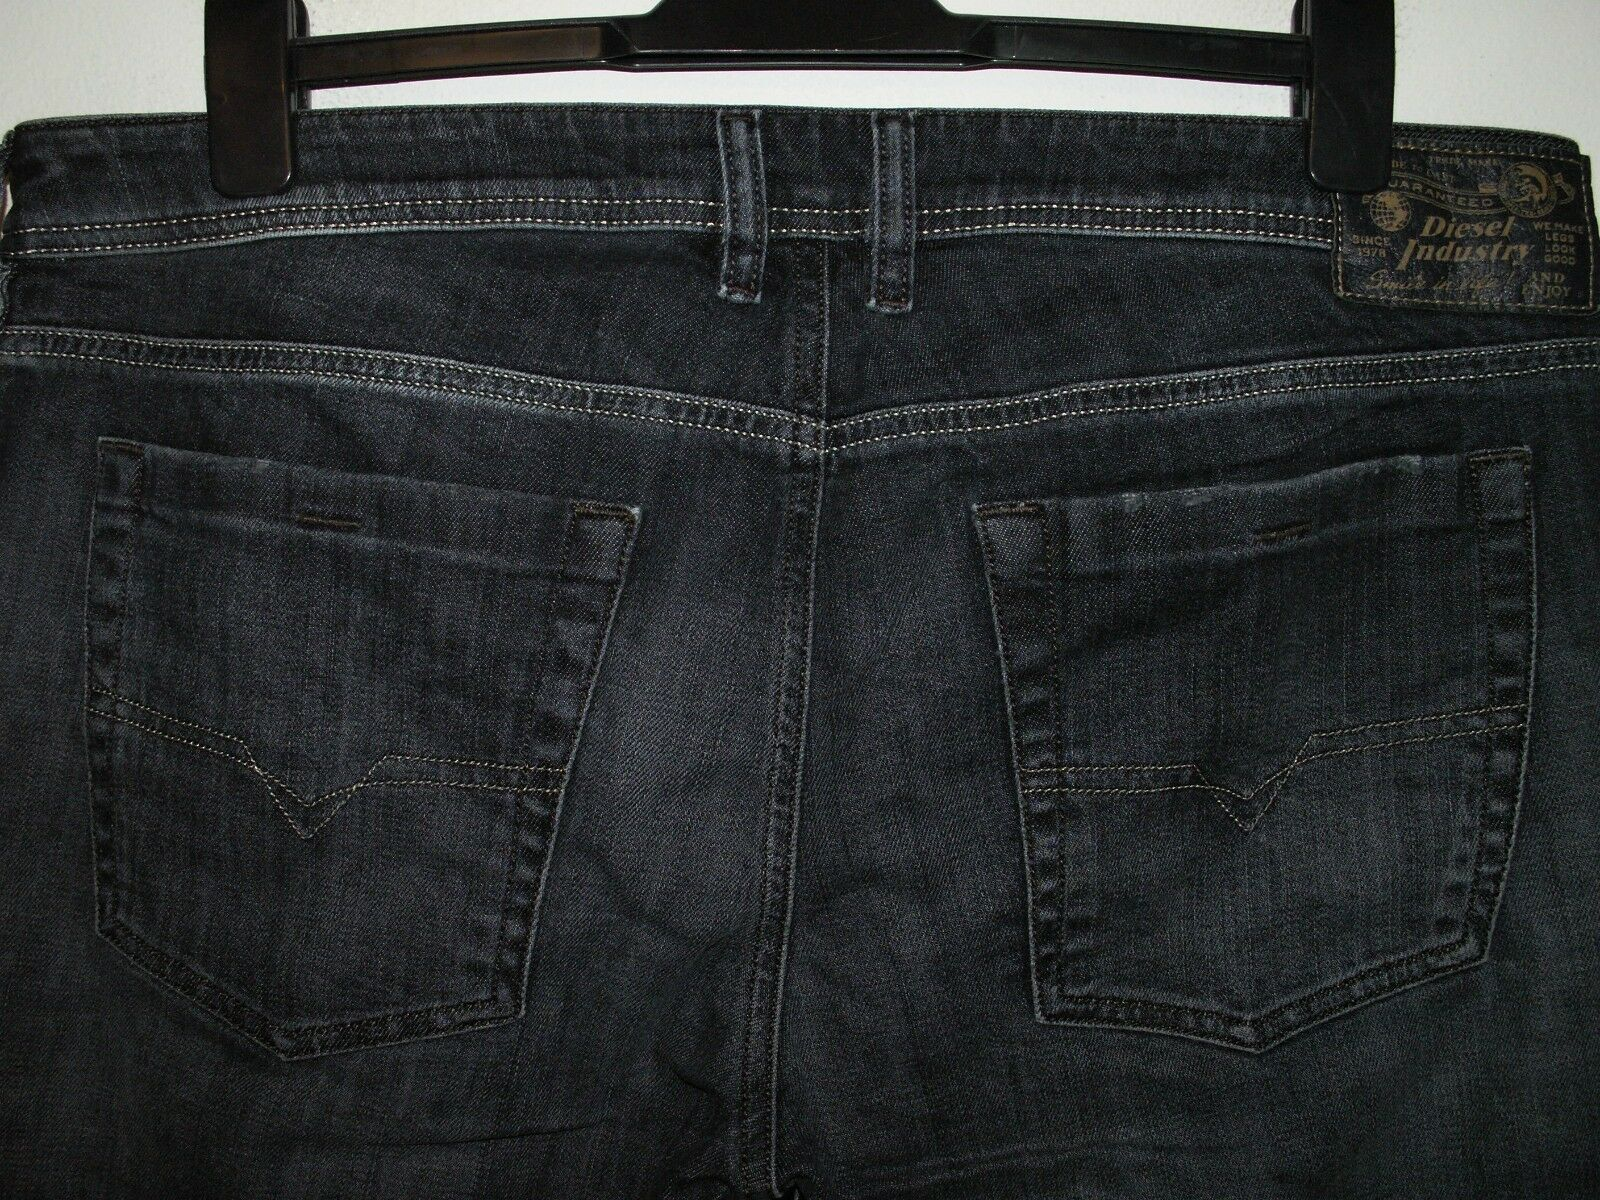 Diesel zathan Stiefelcut jeans wash 0885K stretch W36 L30 (a3337)